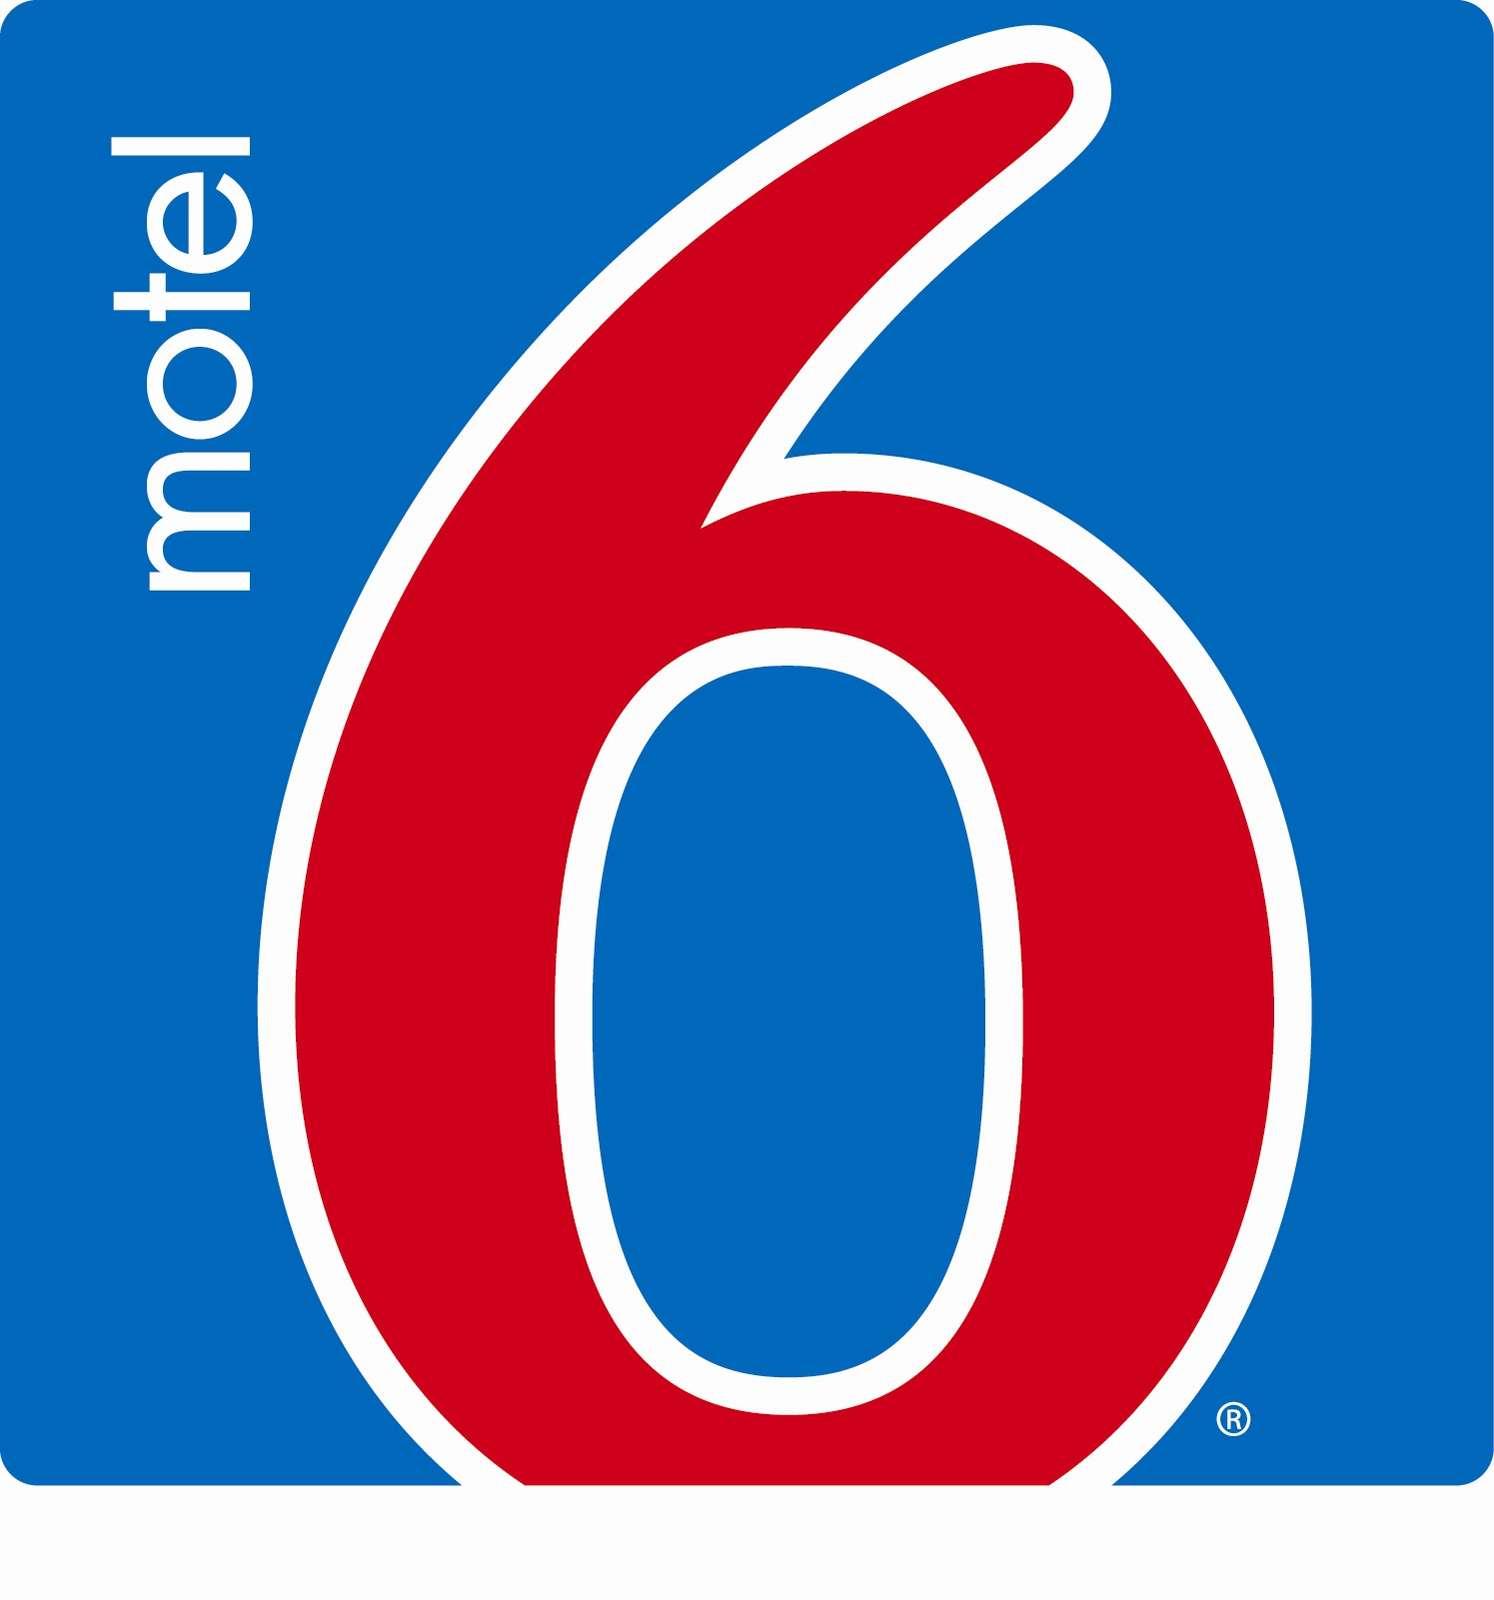 Motel6_Logo_002_.JPG